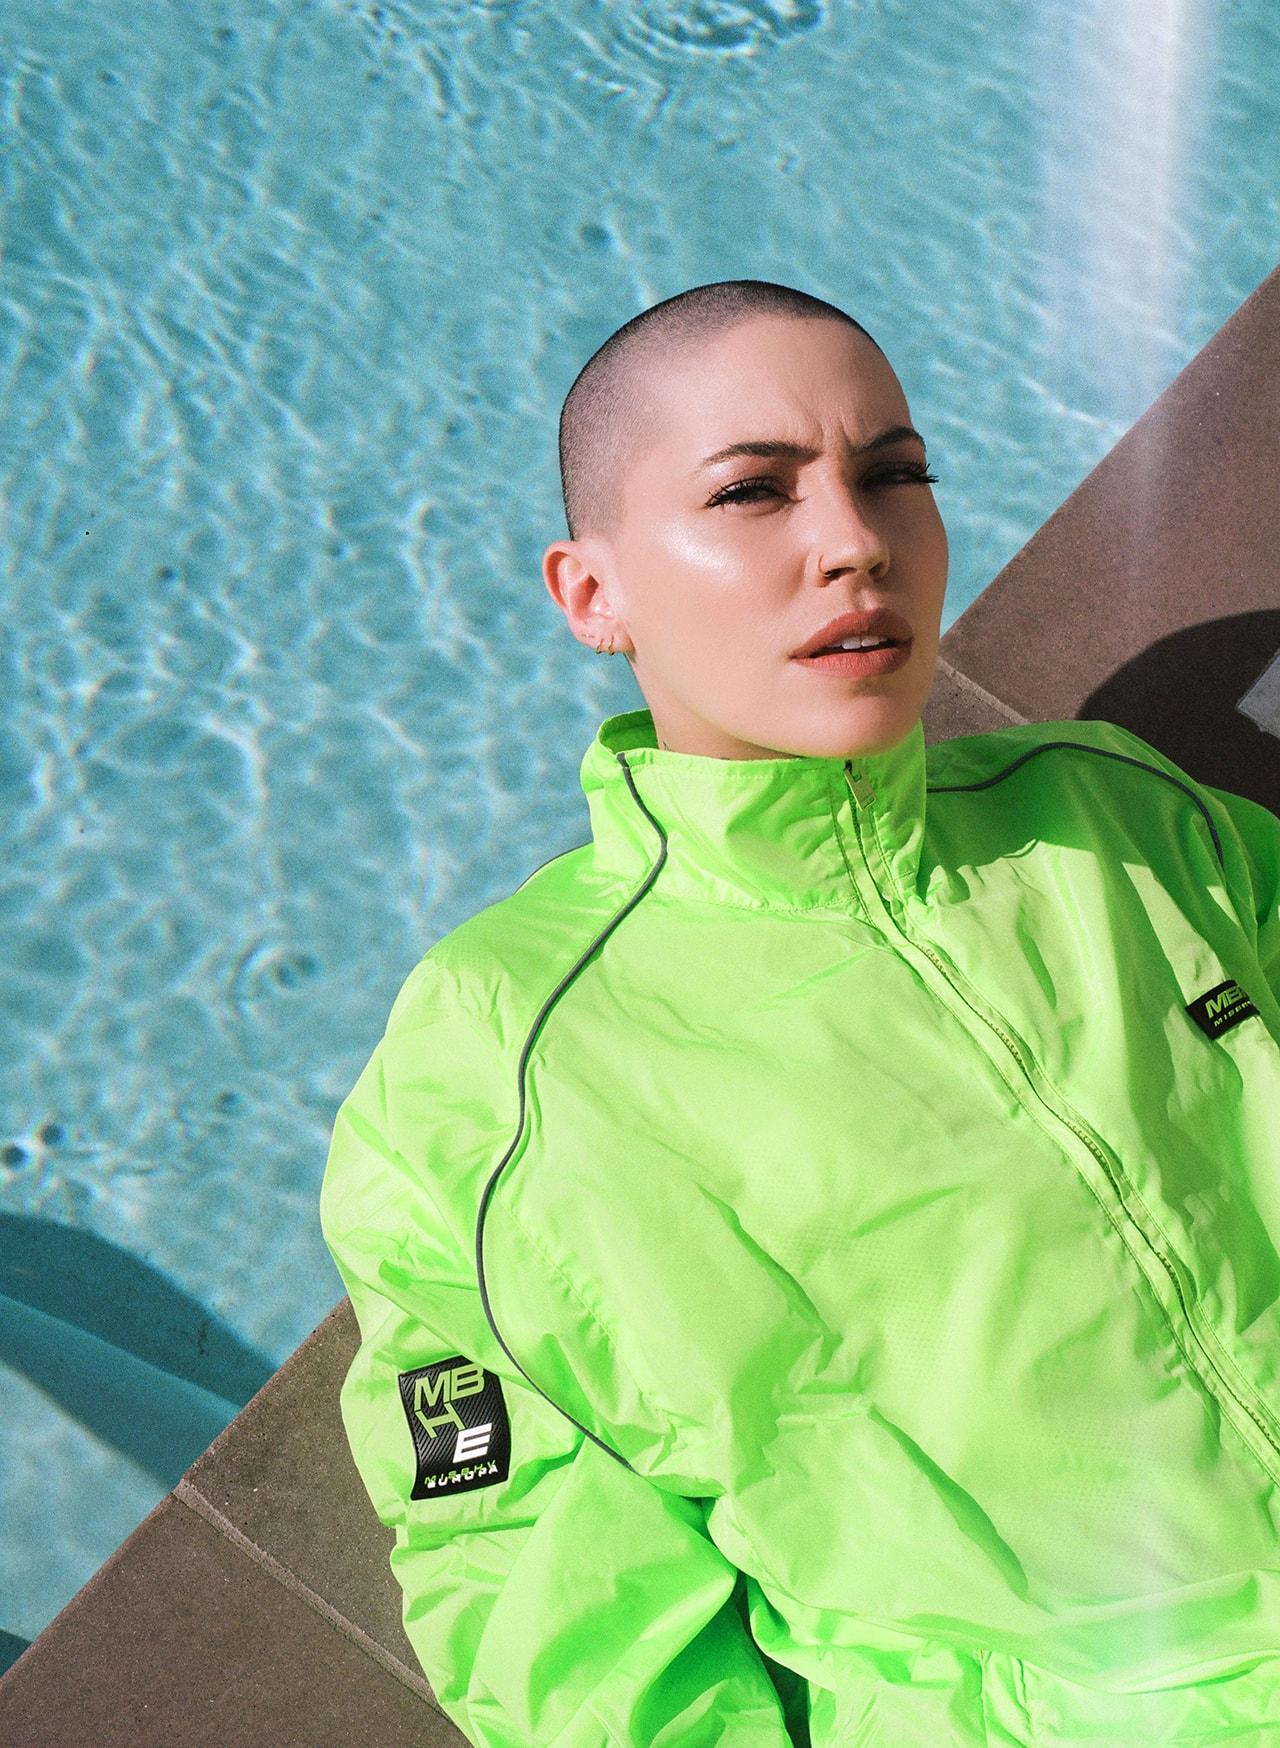 Bishop Briggs Singer Songwriter Music Artist Sarah Grace McLaughlin Shaved Head Tattoos Misbhv Neon Green Tracksuit